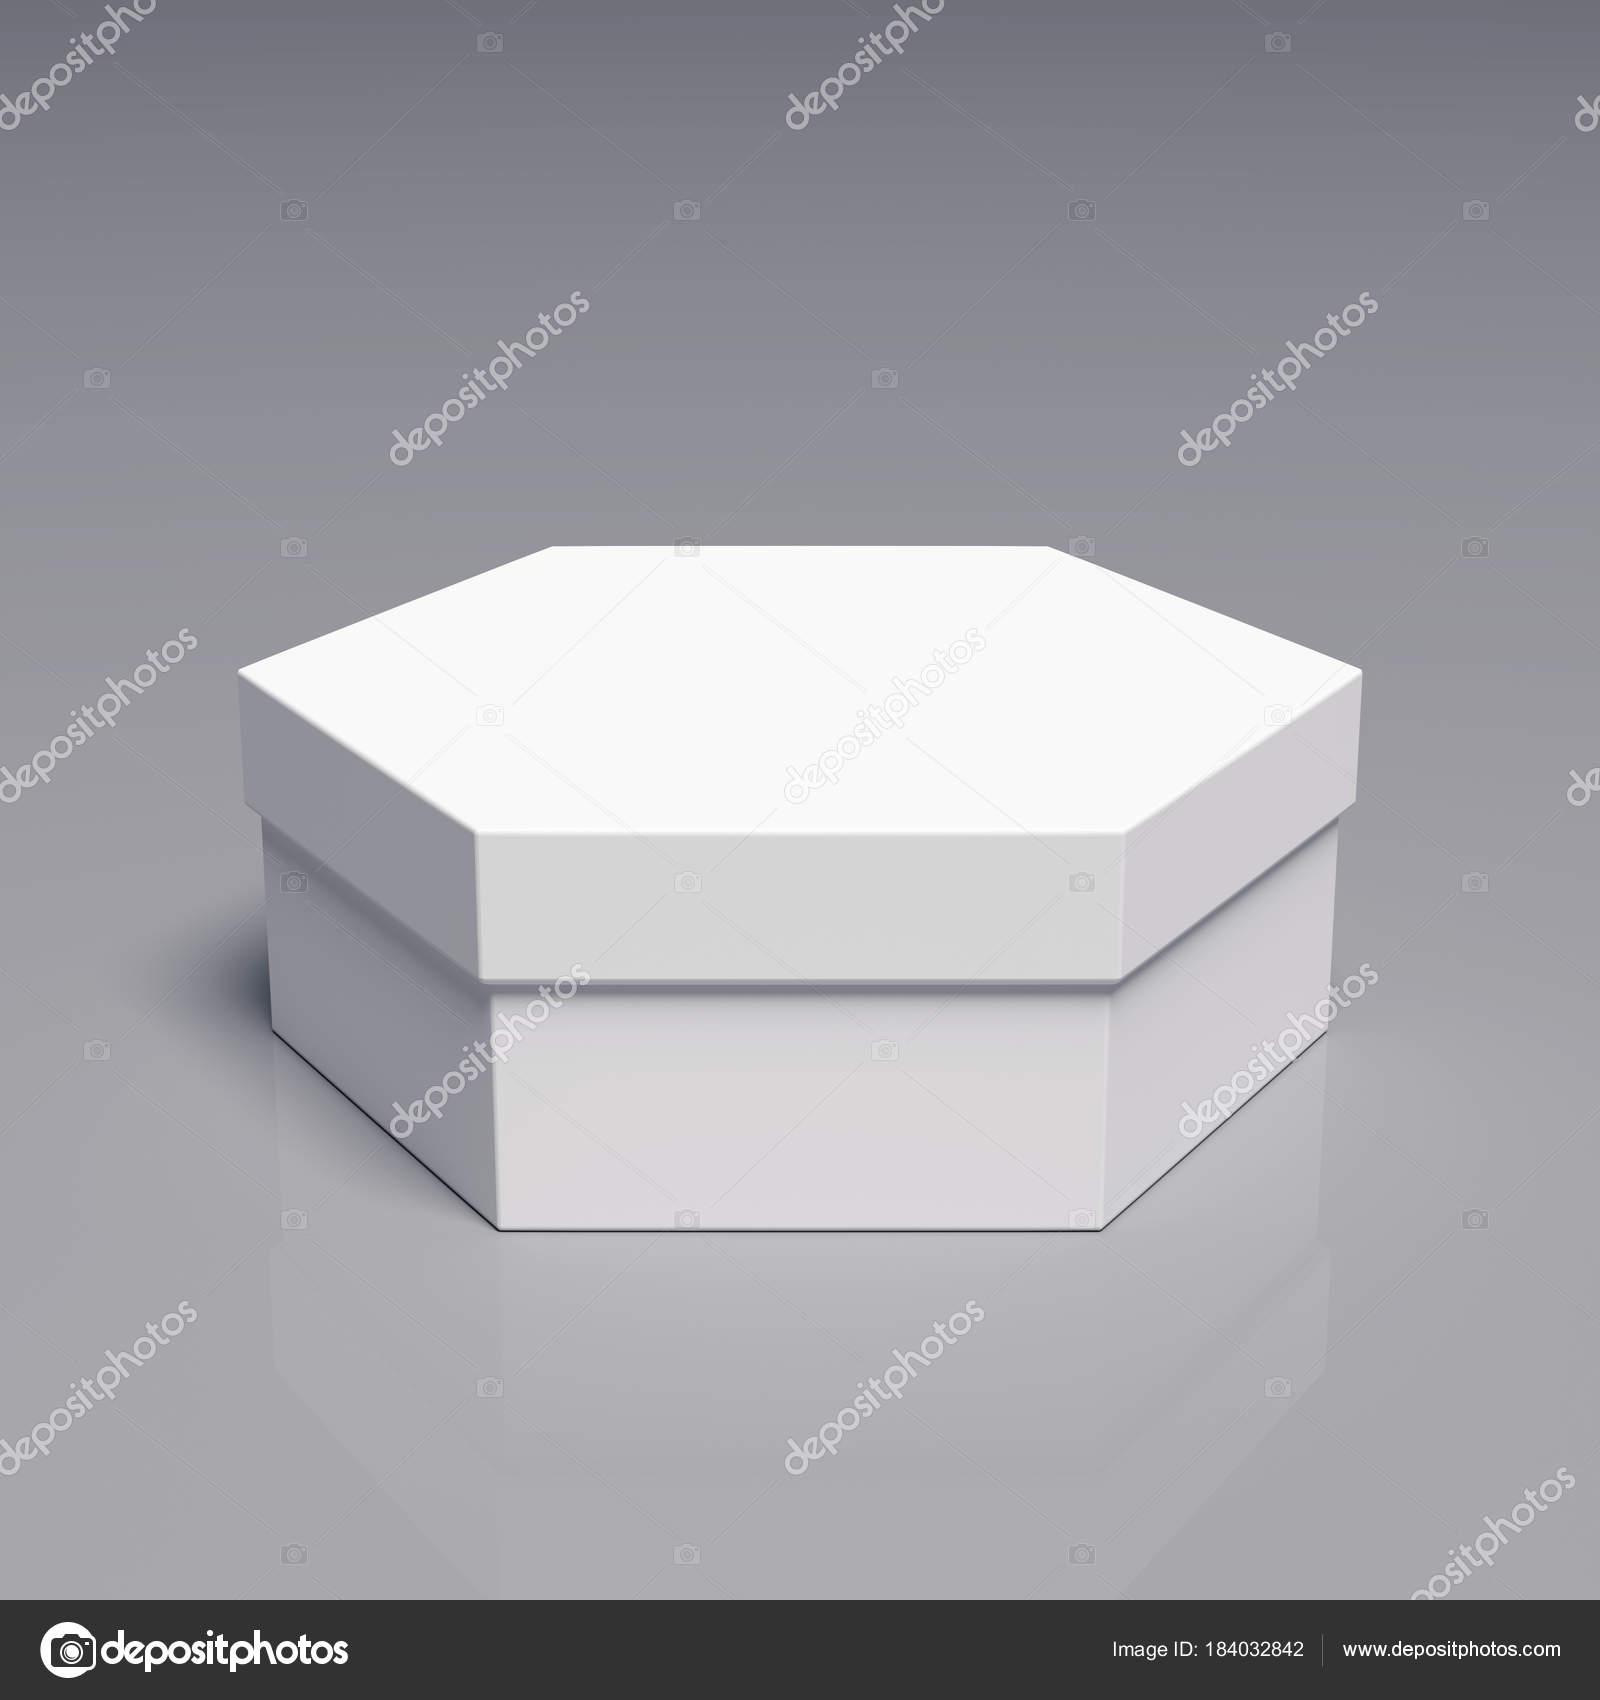 plantilla de caja de cartón — Foto de stock © TissaNsk #184032842